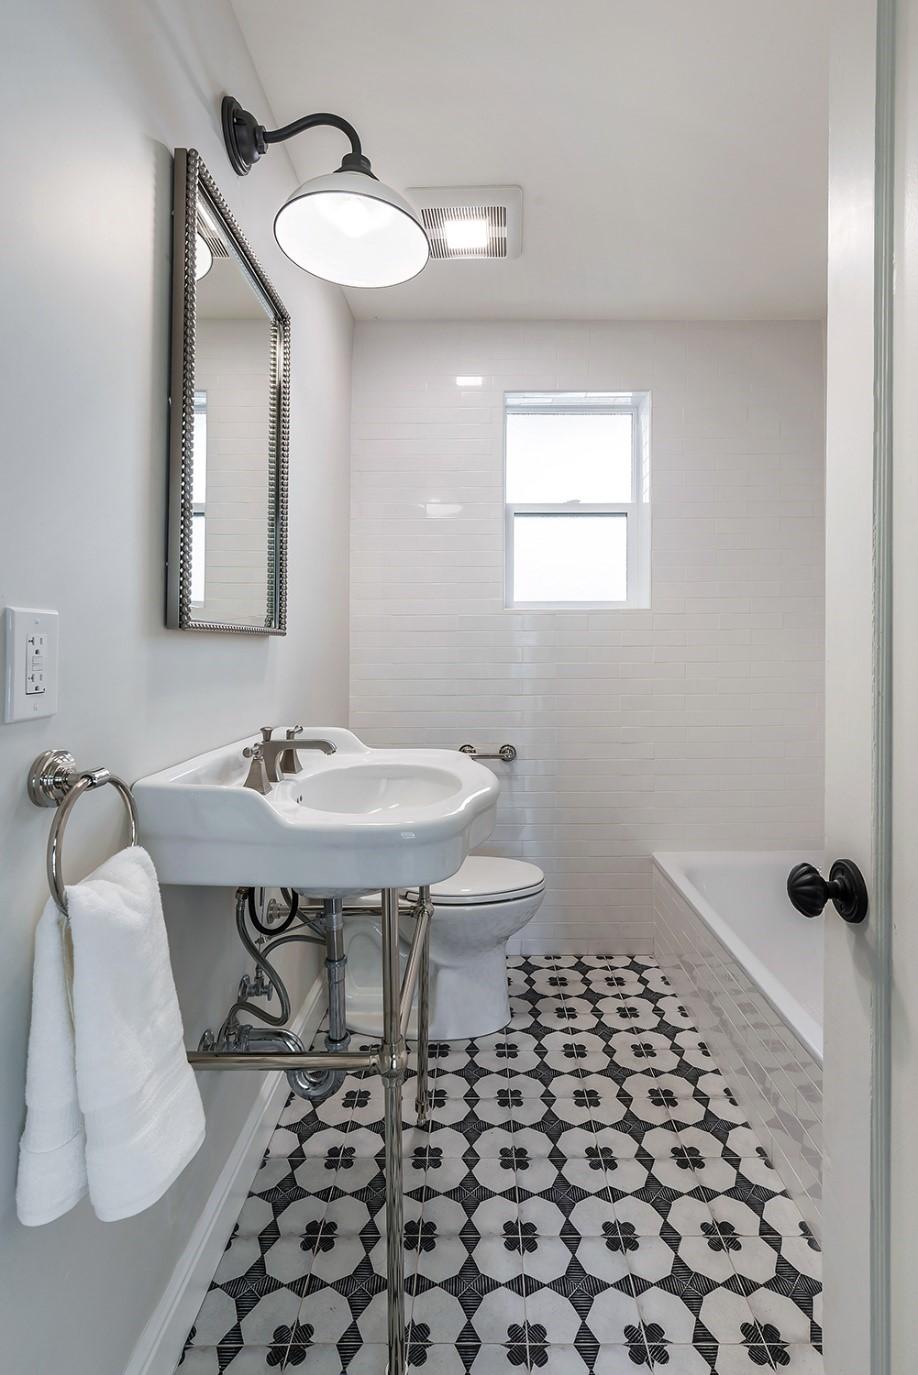 Bathroom Renovation In Healdsburg